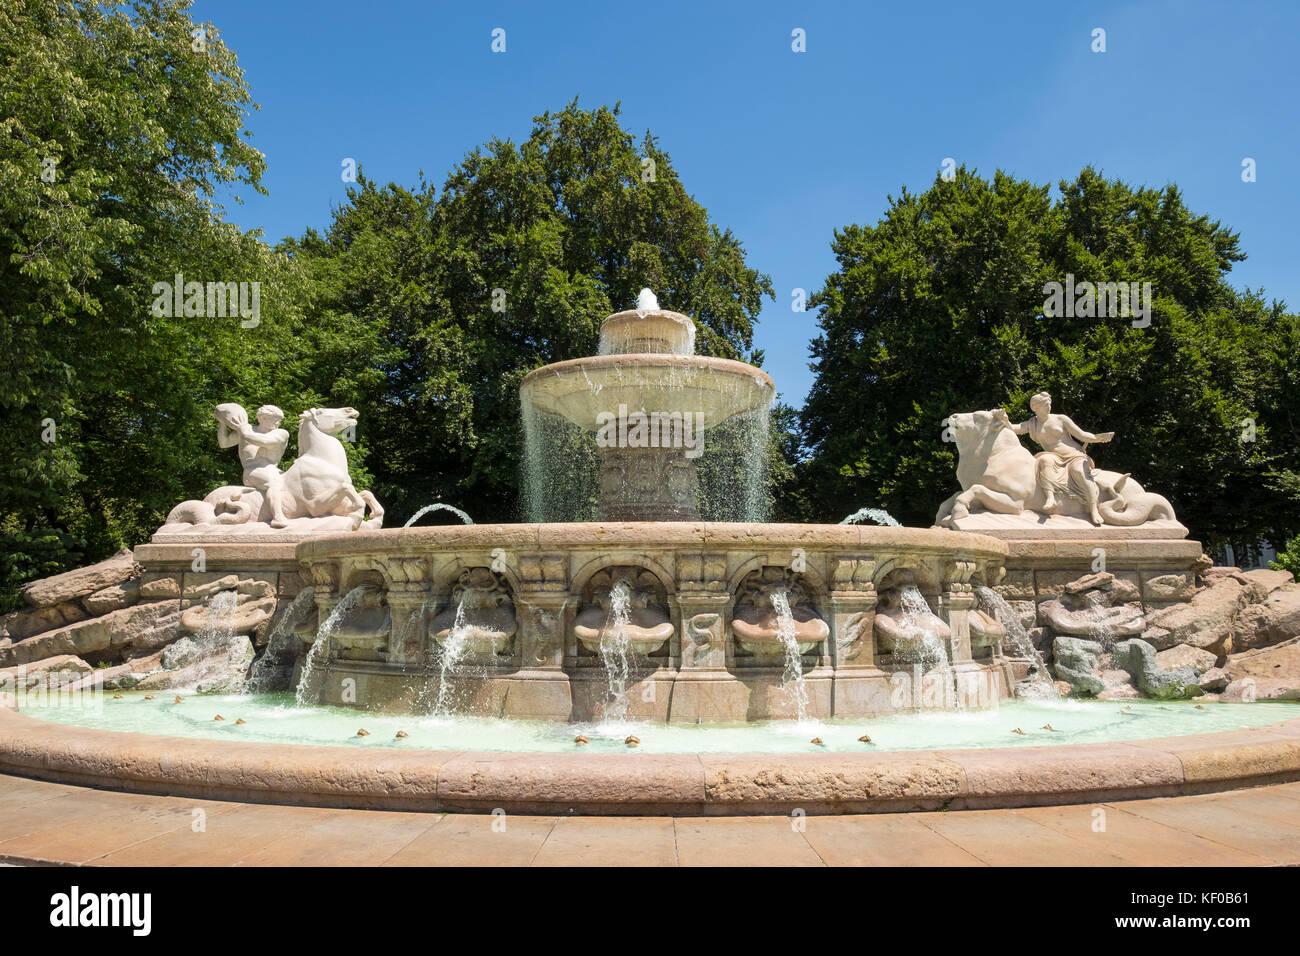 Wittelsbacher Brunnen, Lenbachplatz, Altstadt, München, Oberbayern, Bayern, Deutschland - Stock Image